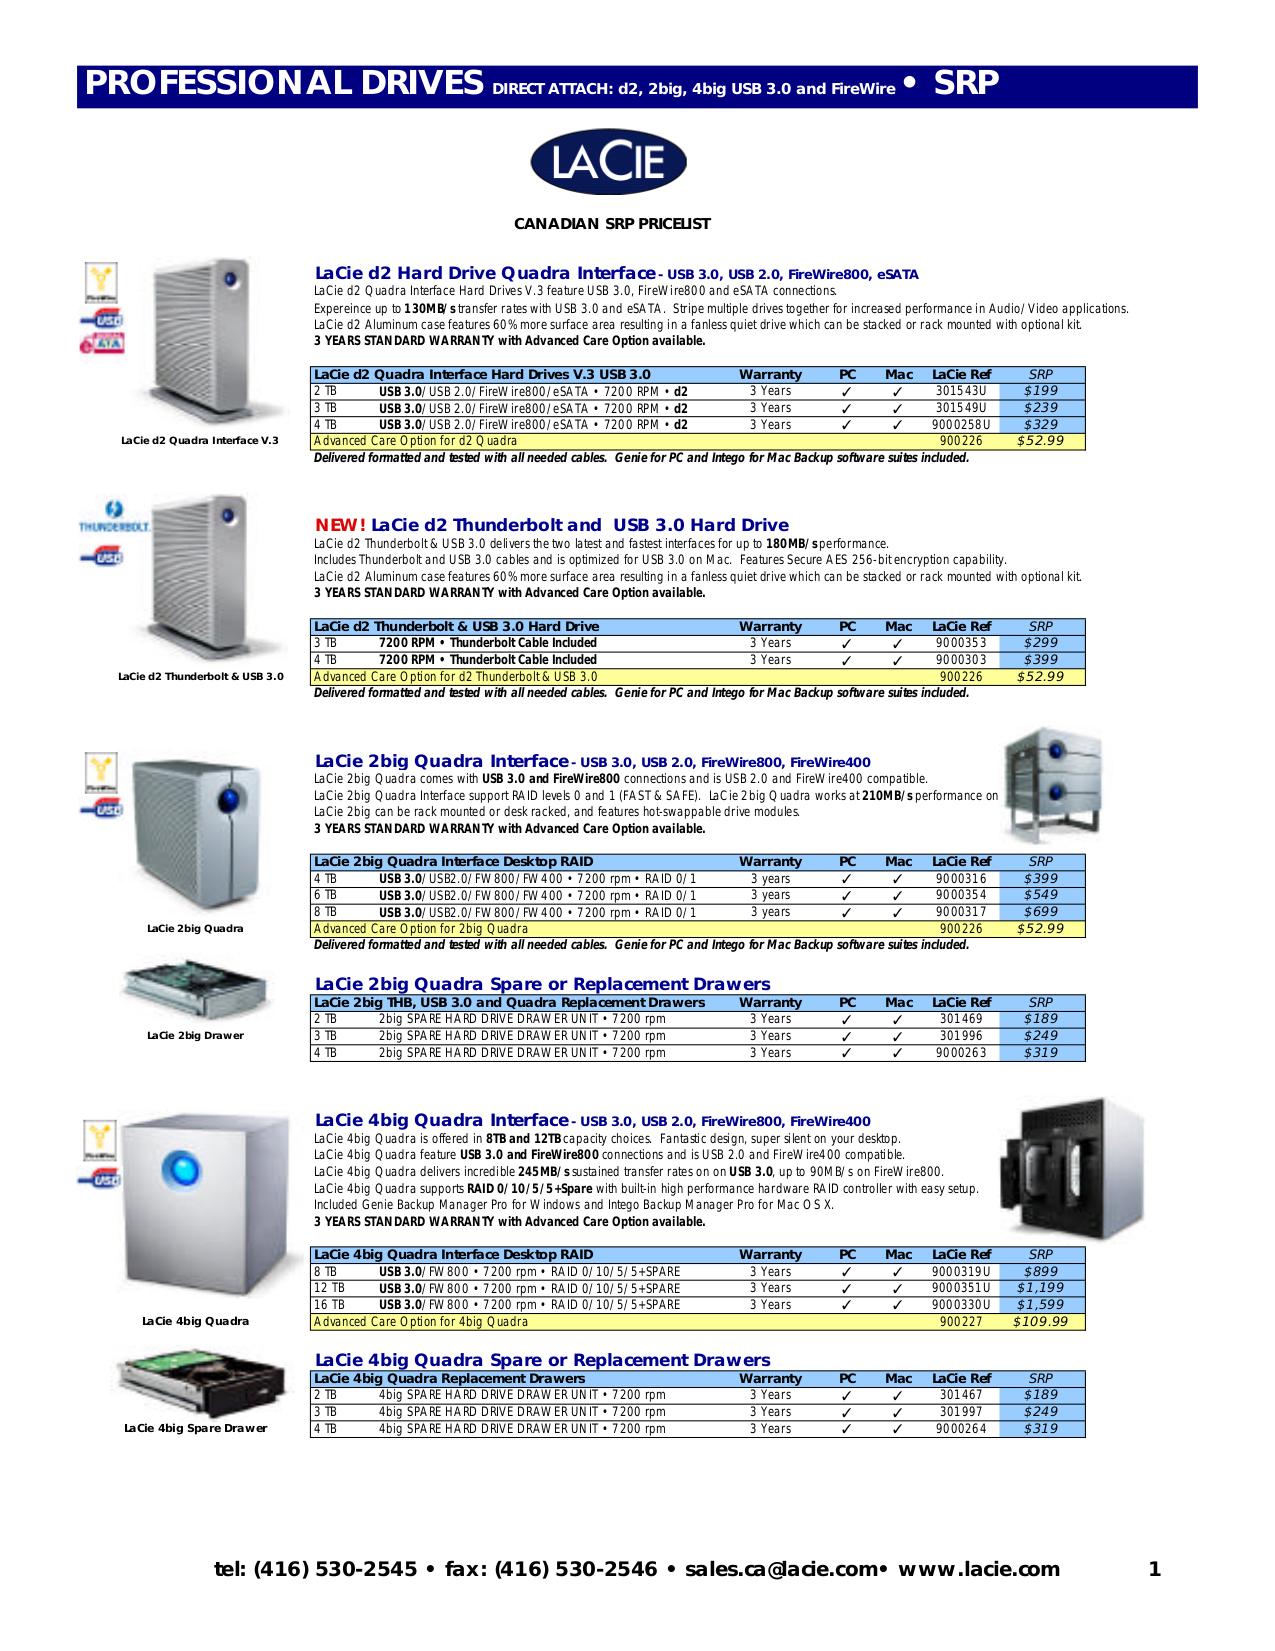 pdf for LaCie Storage 302000 manual